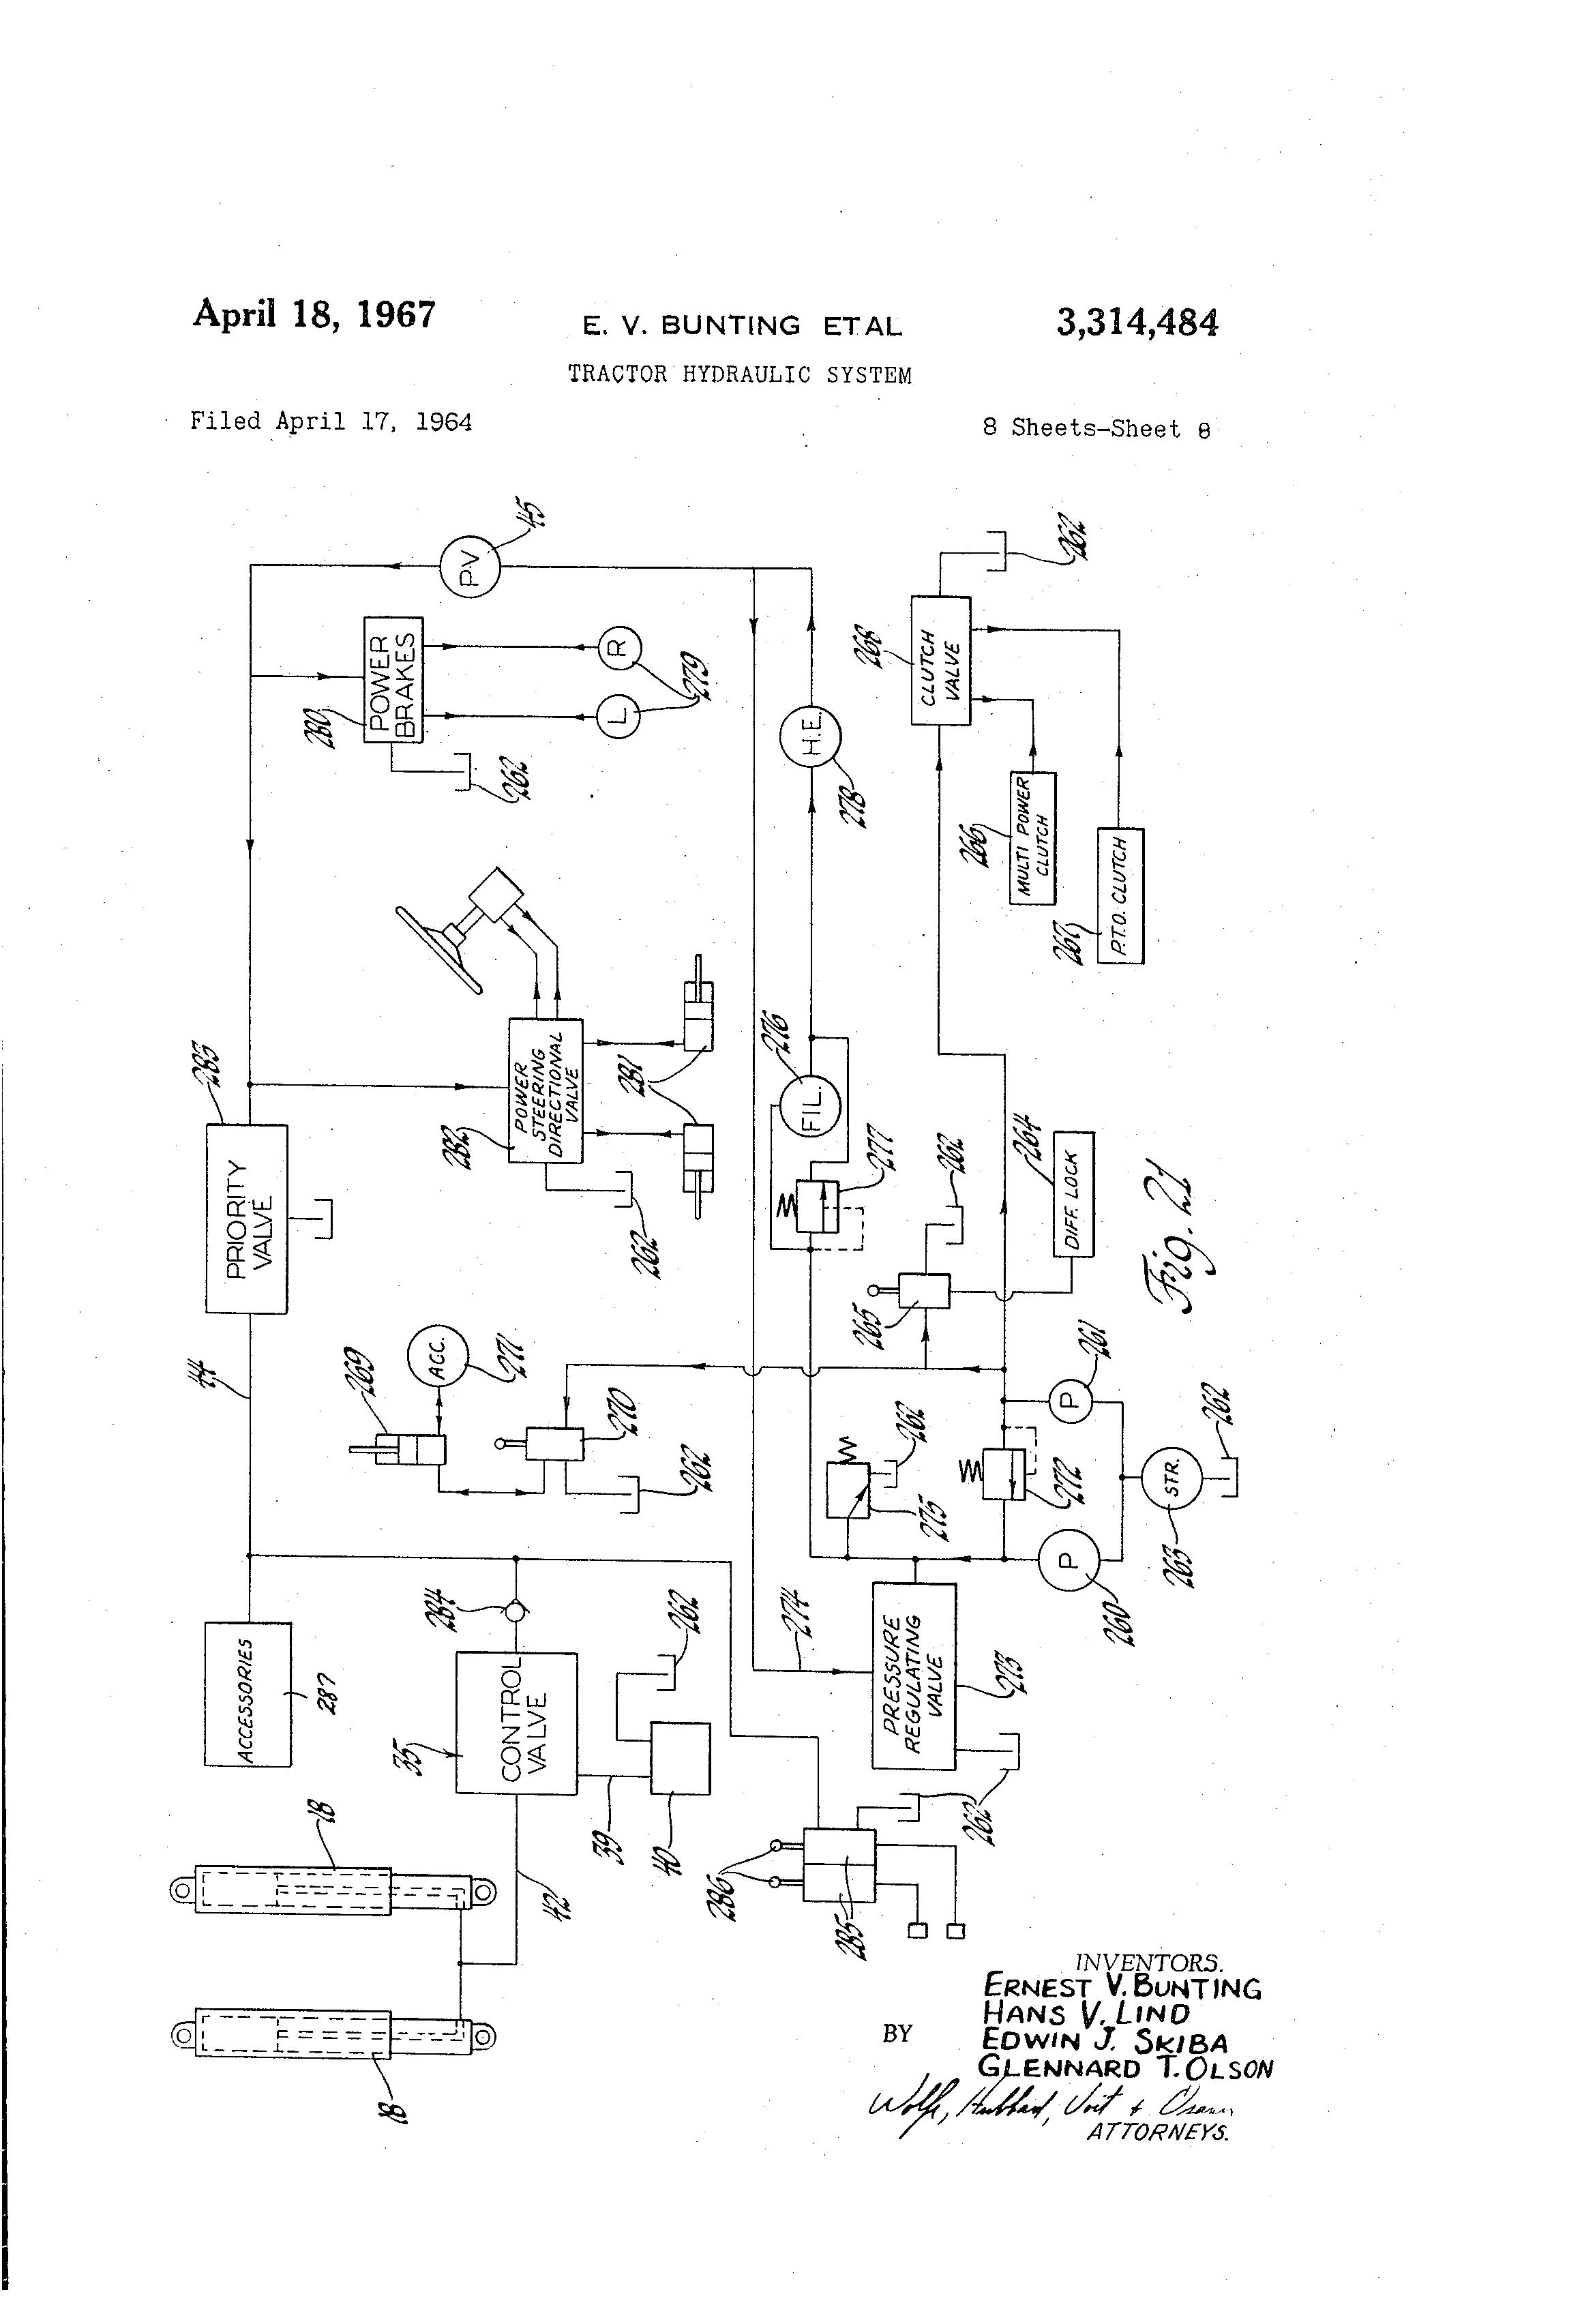 john deere 2520 wiring diagram. Black Bedroom Furniture Sets. Home Design Ideas